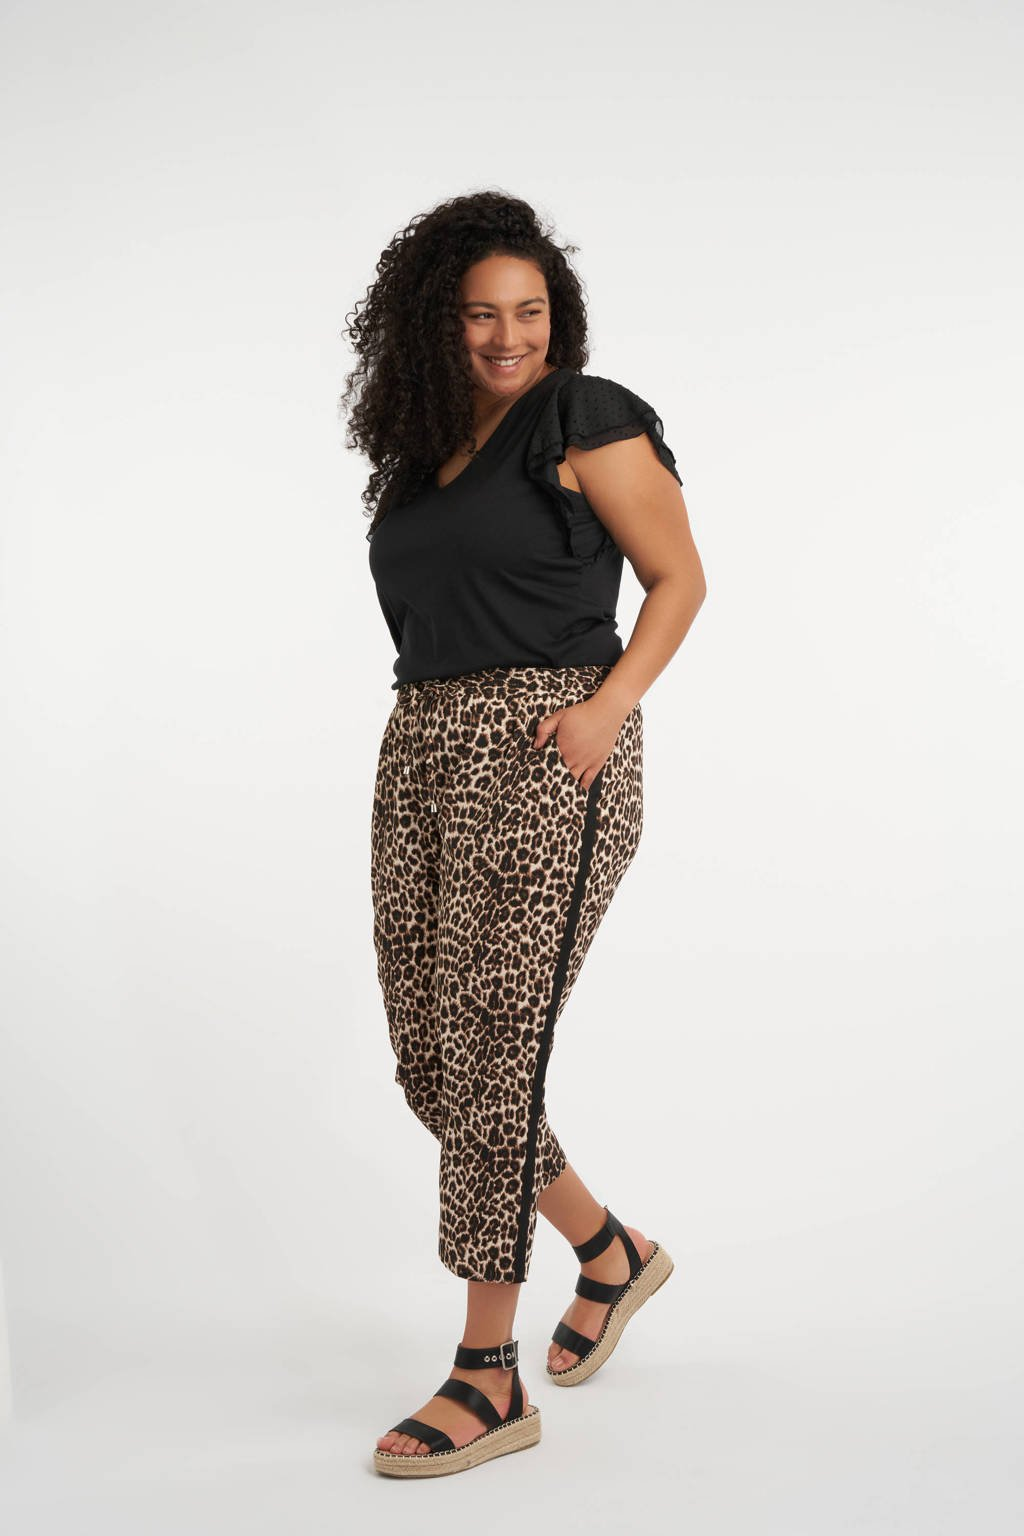 MS Mode cropped slim fit broek met panterprint beige/zwart, Beige/zwart